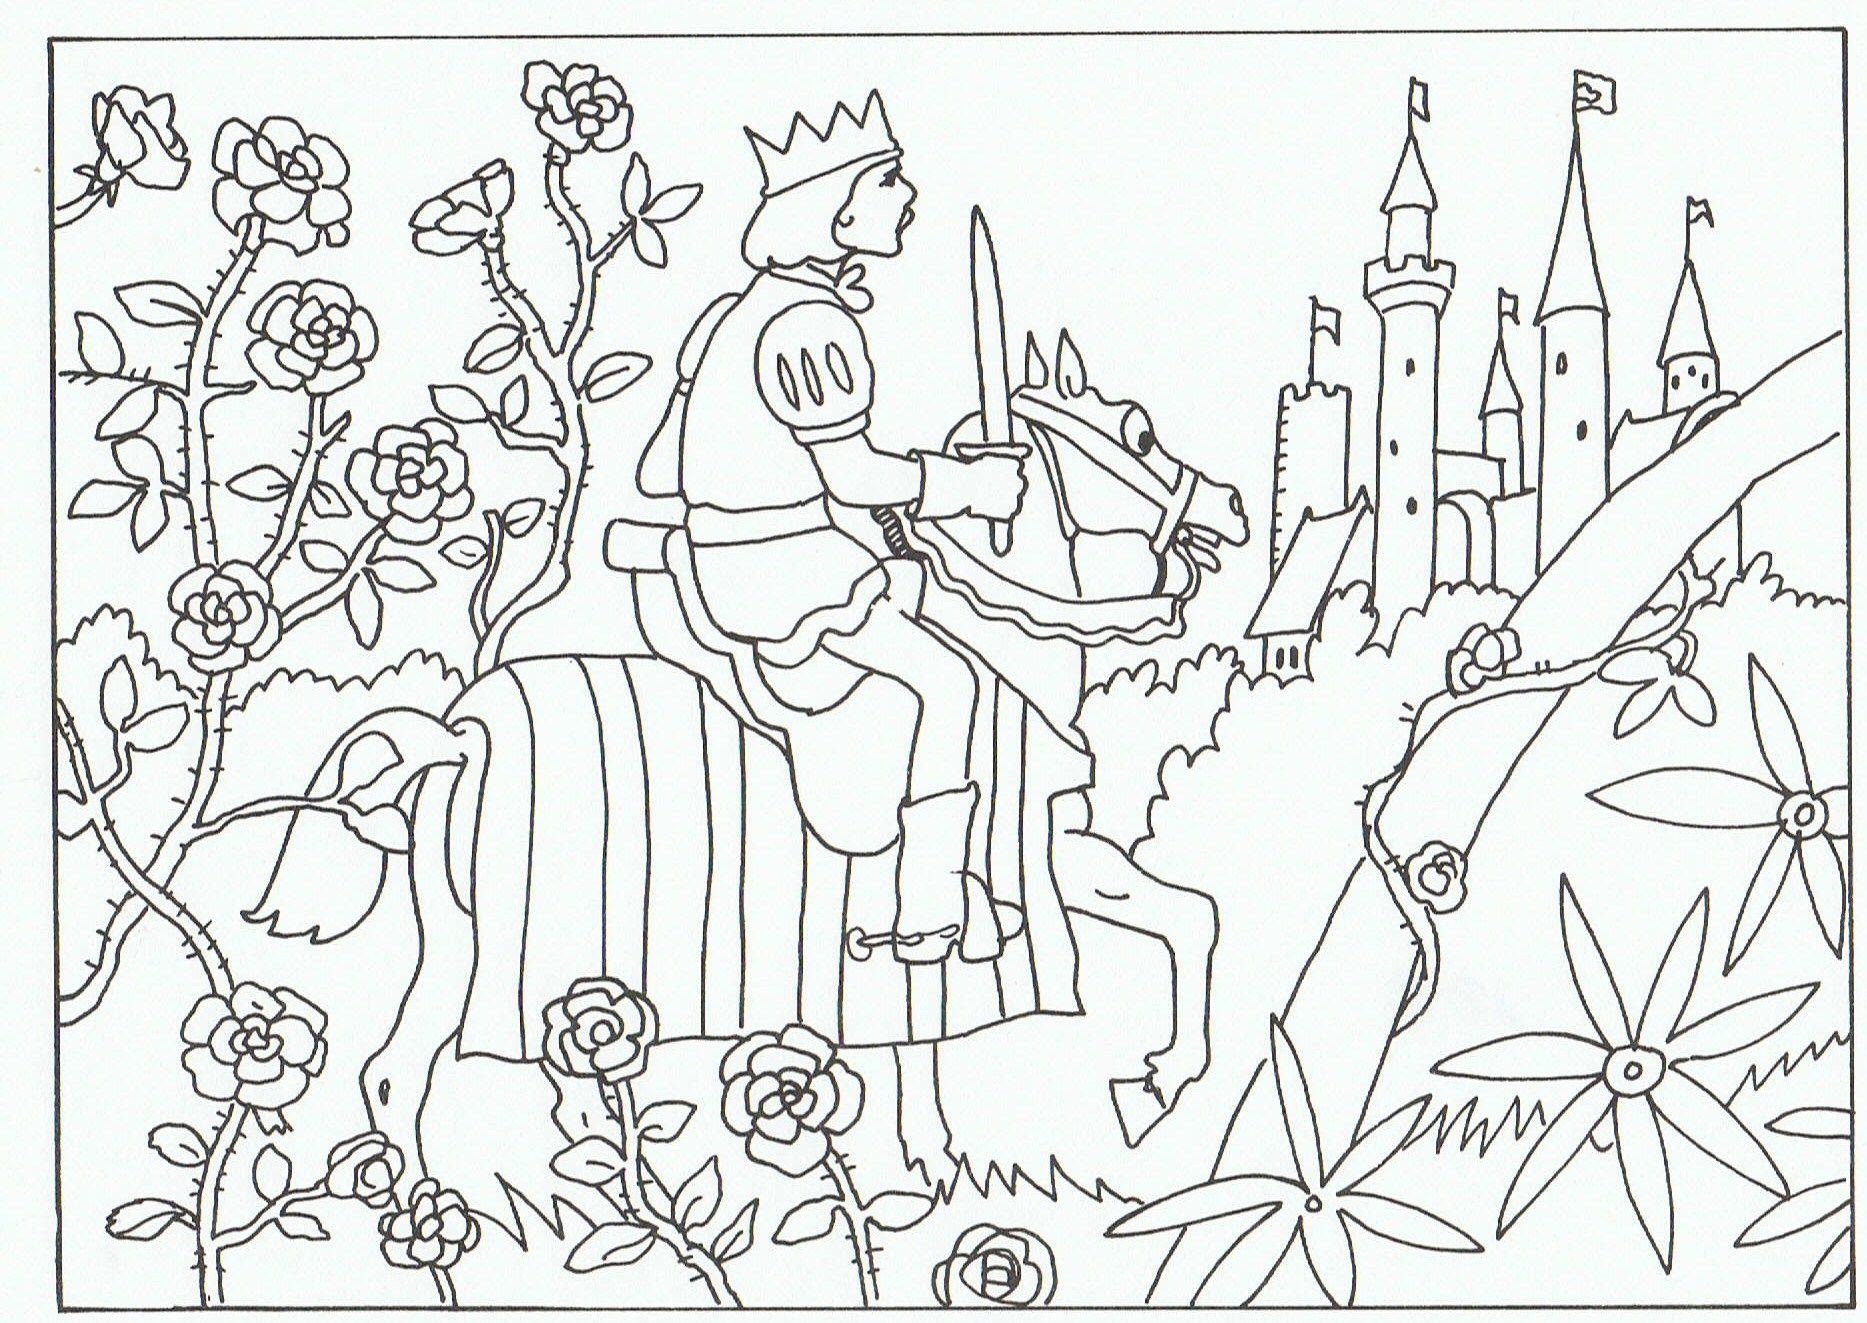 Pin de Aynil Akbaş en Fairy tales | Pinterest | Jordi, Dibujos para ...